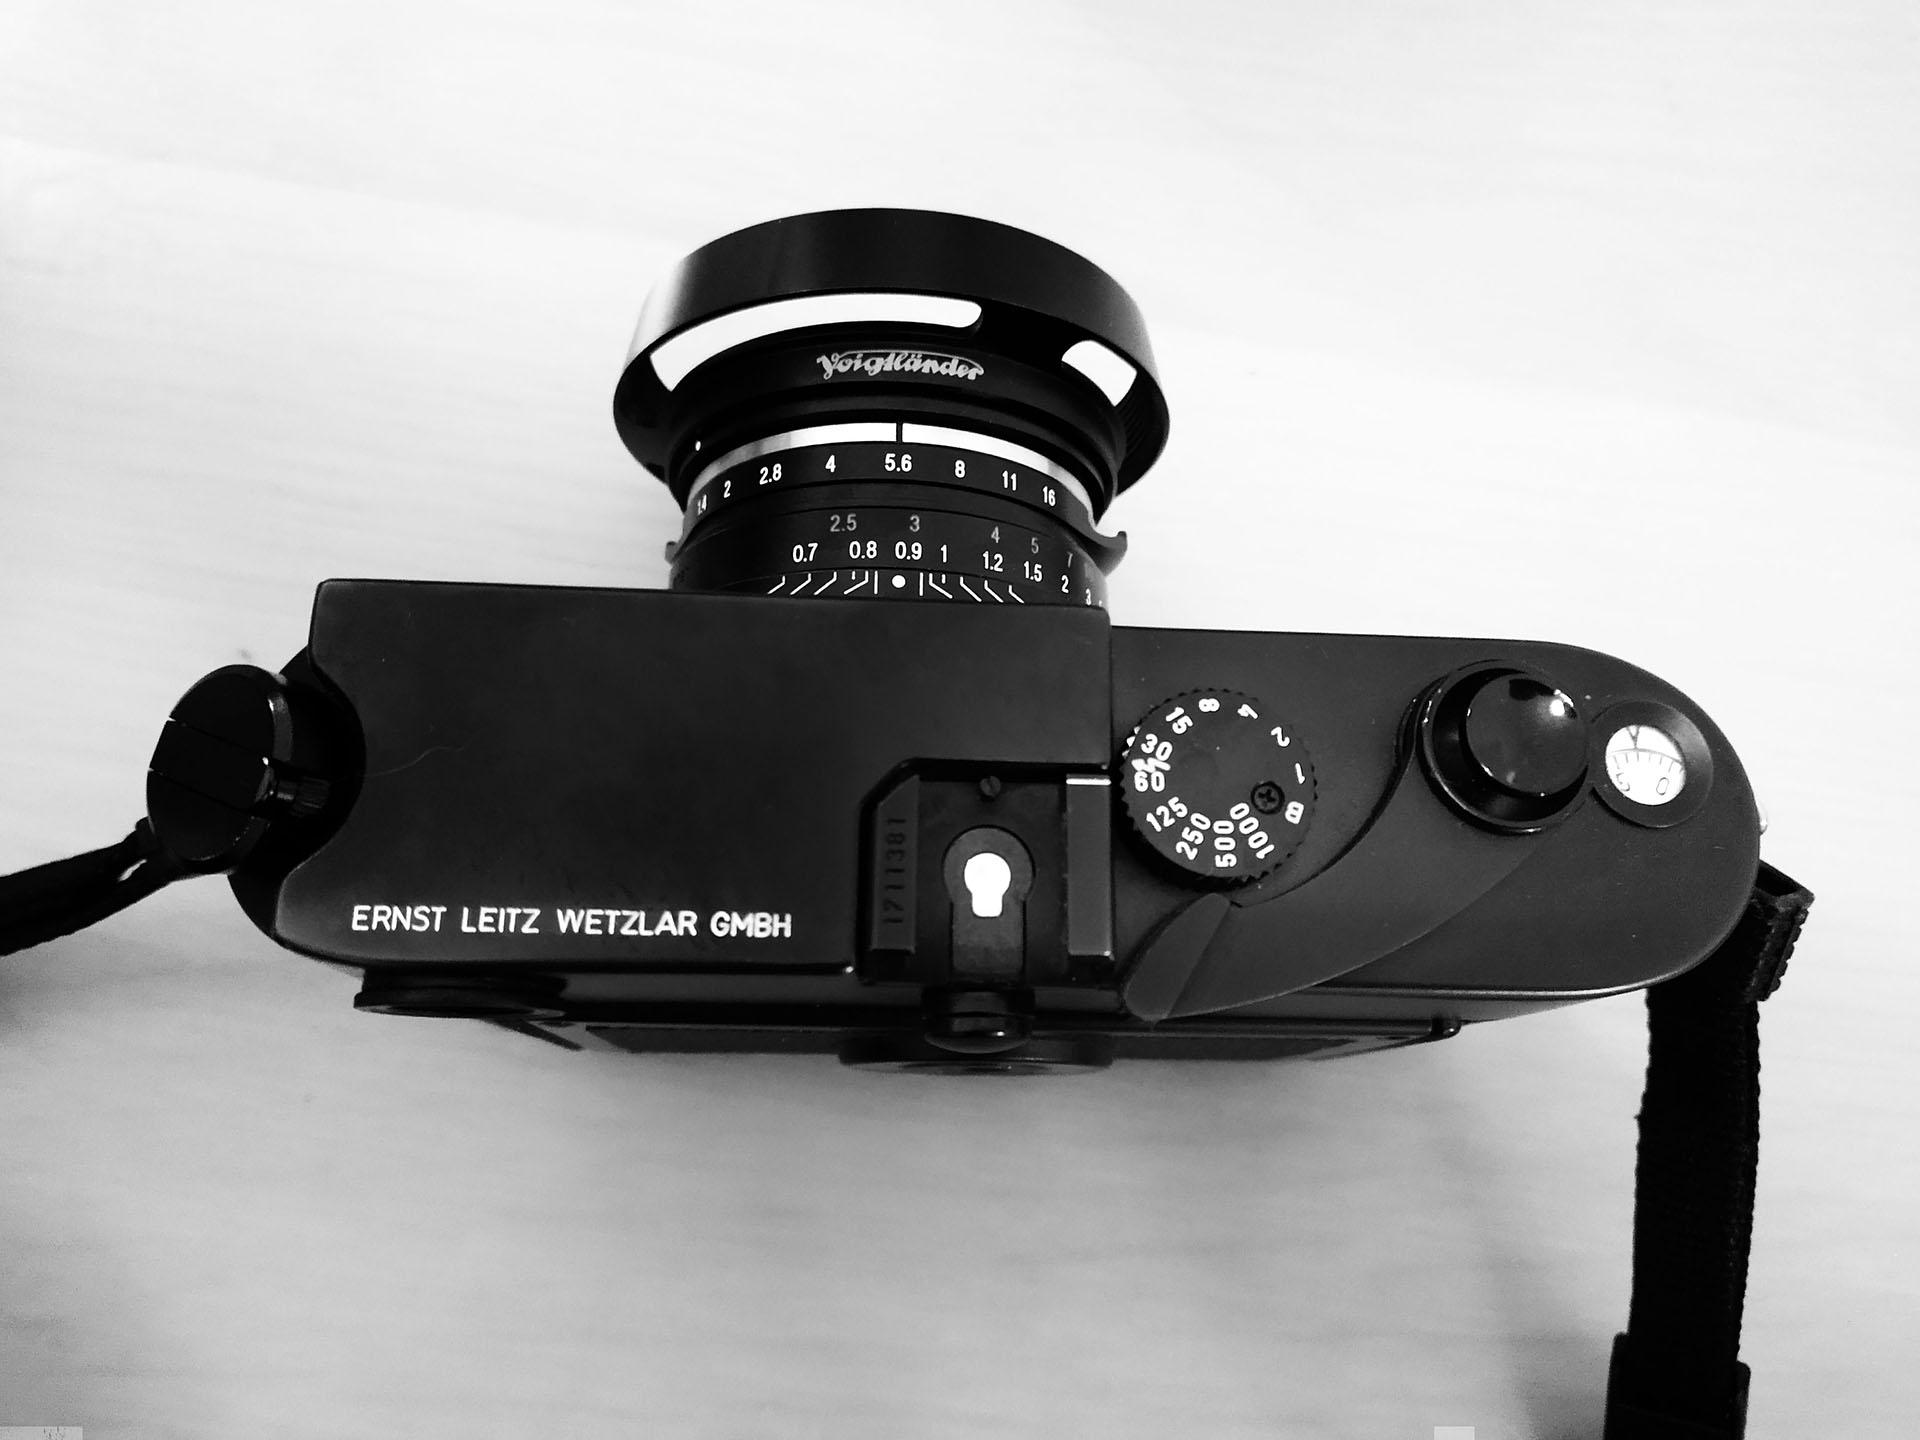 Leica M6 MP lever